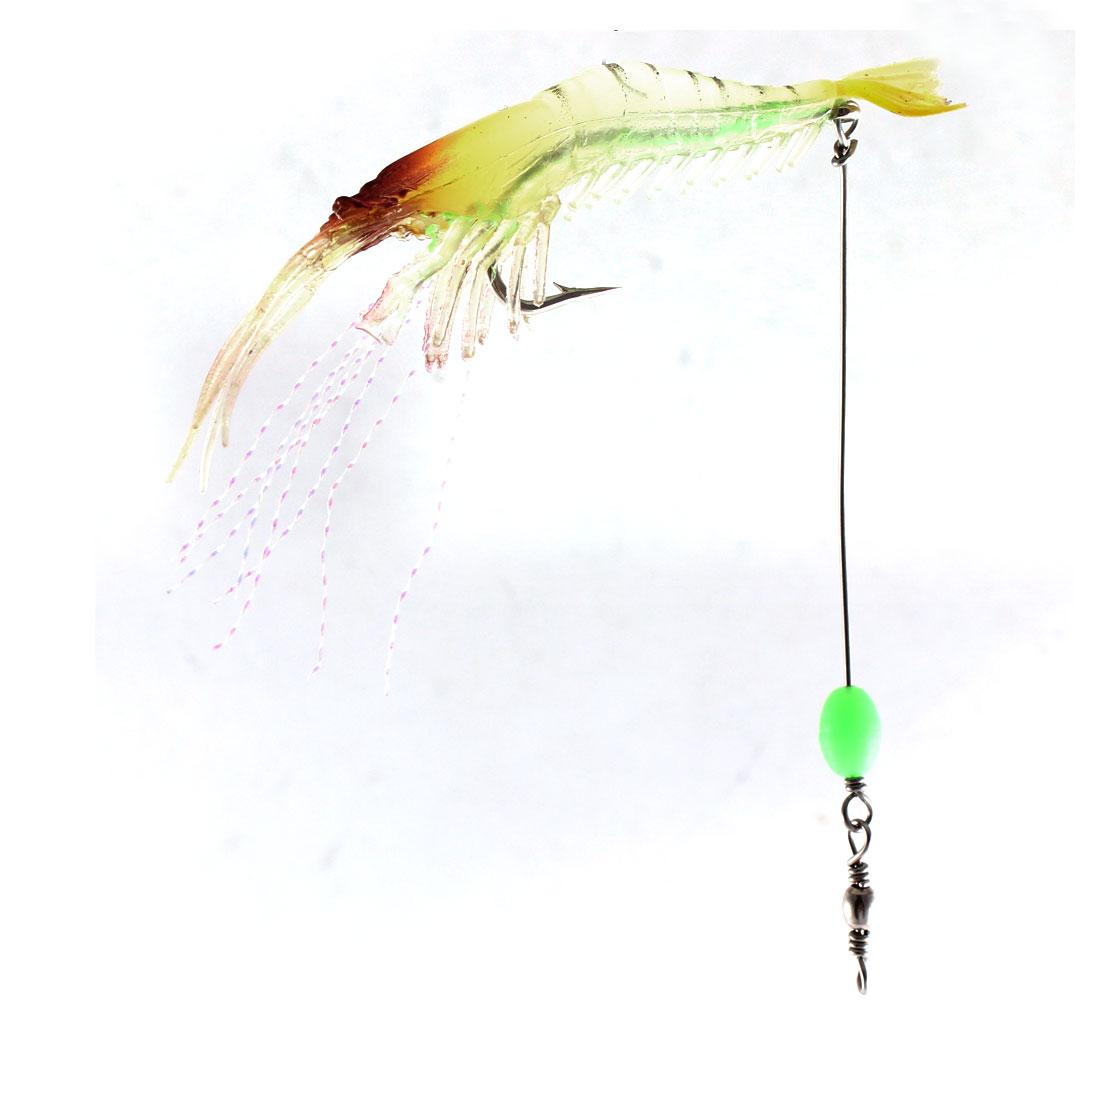 Metal Fishhook Soft Plastic Shrimp Design Fishing Lure Bait Tackle Angling Tool